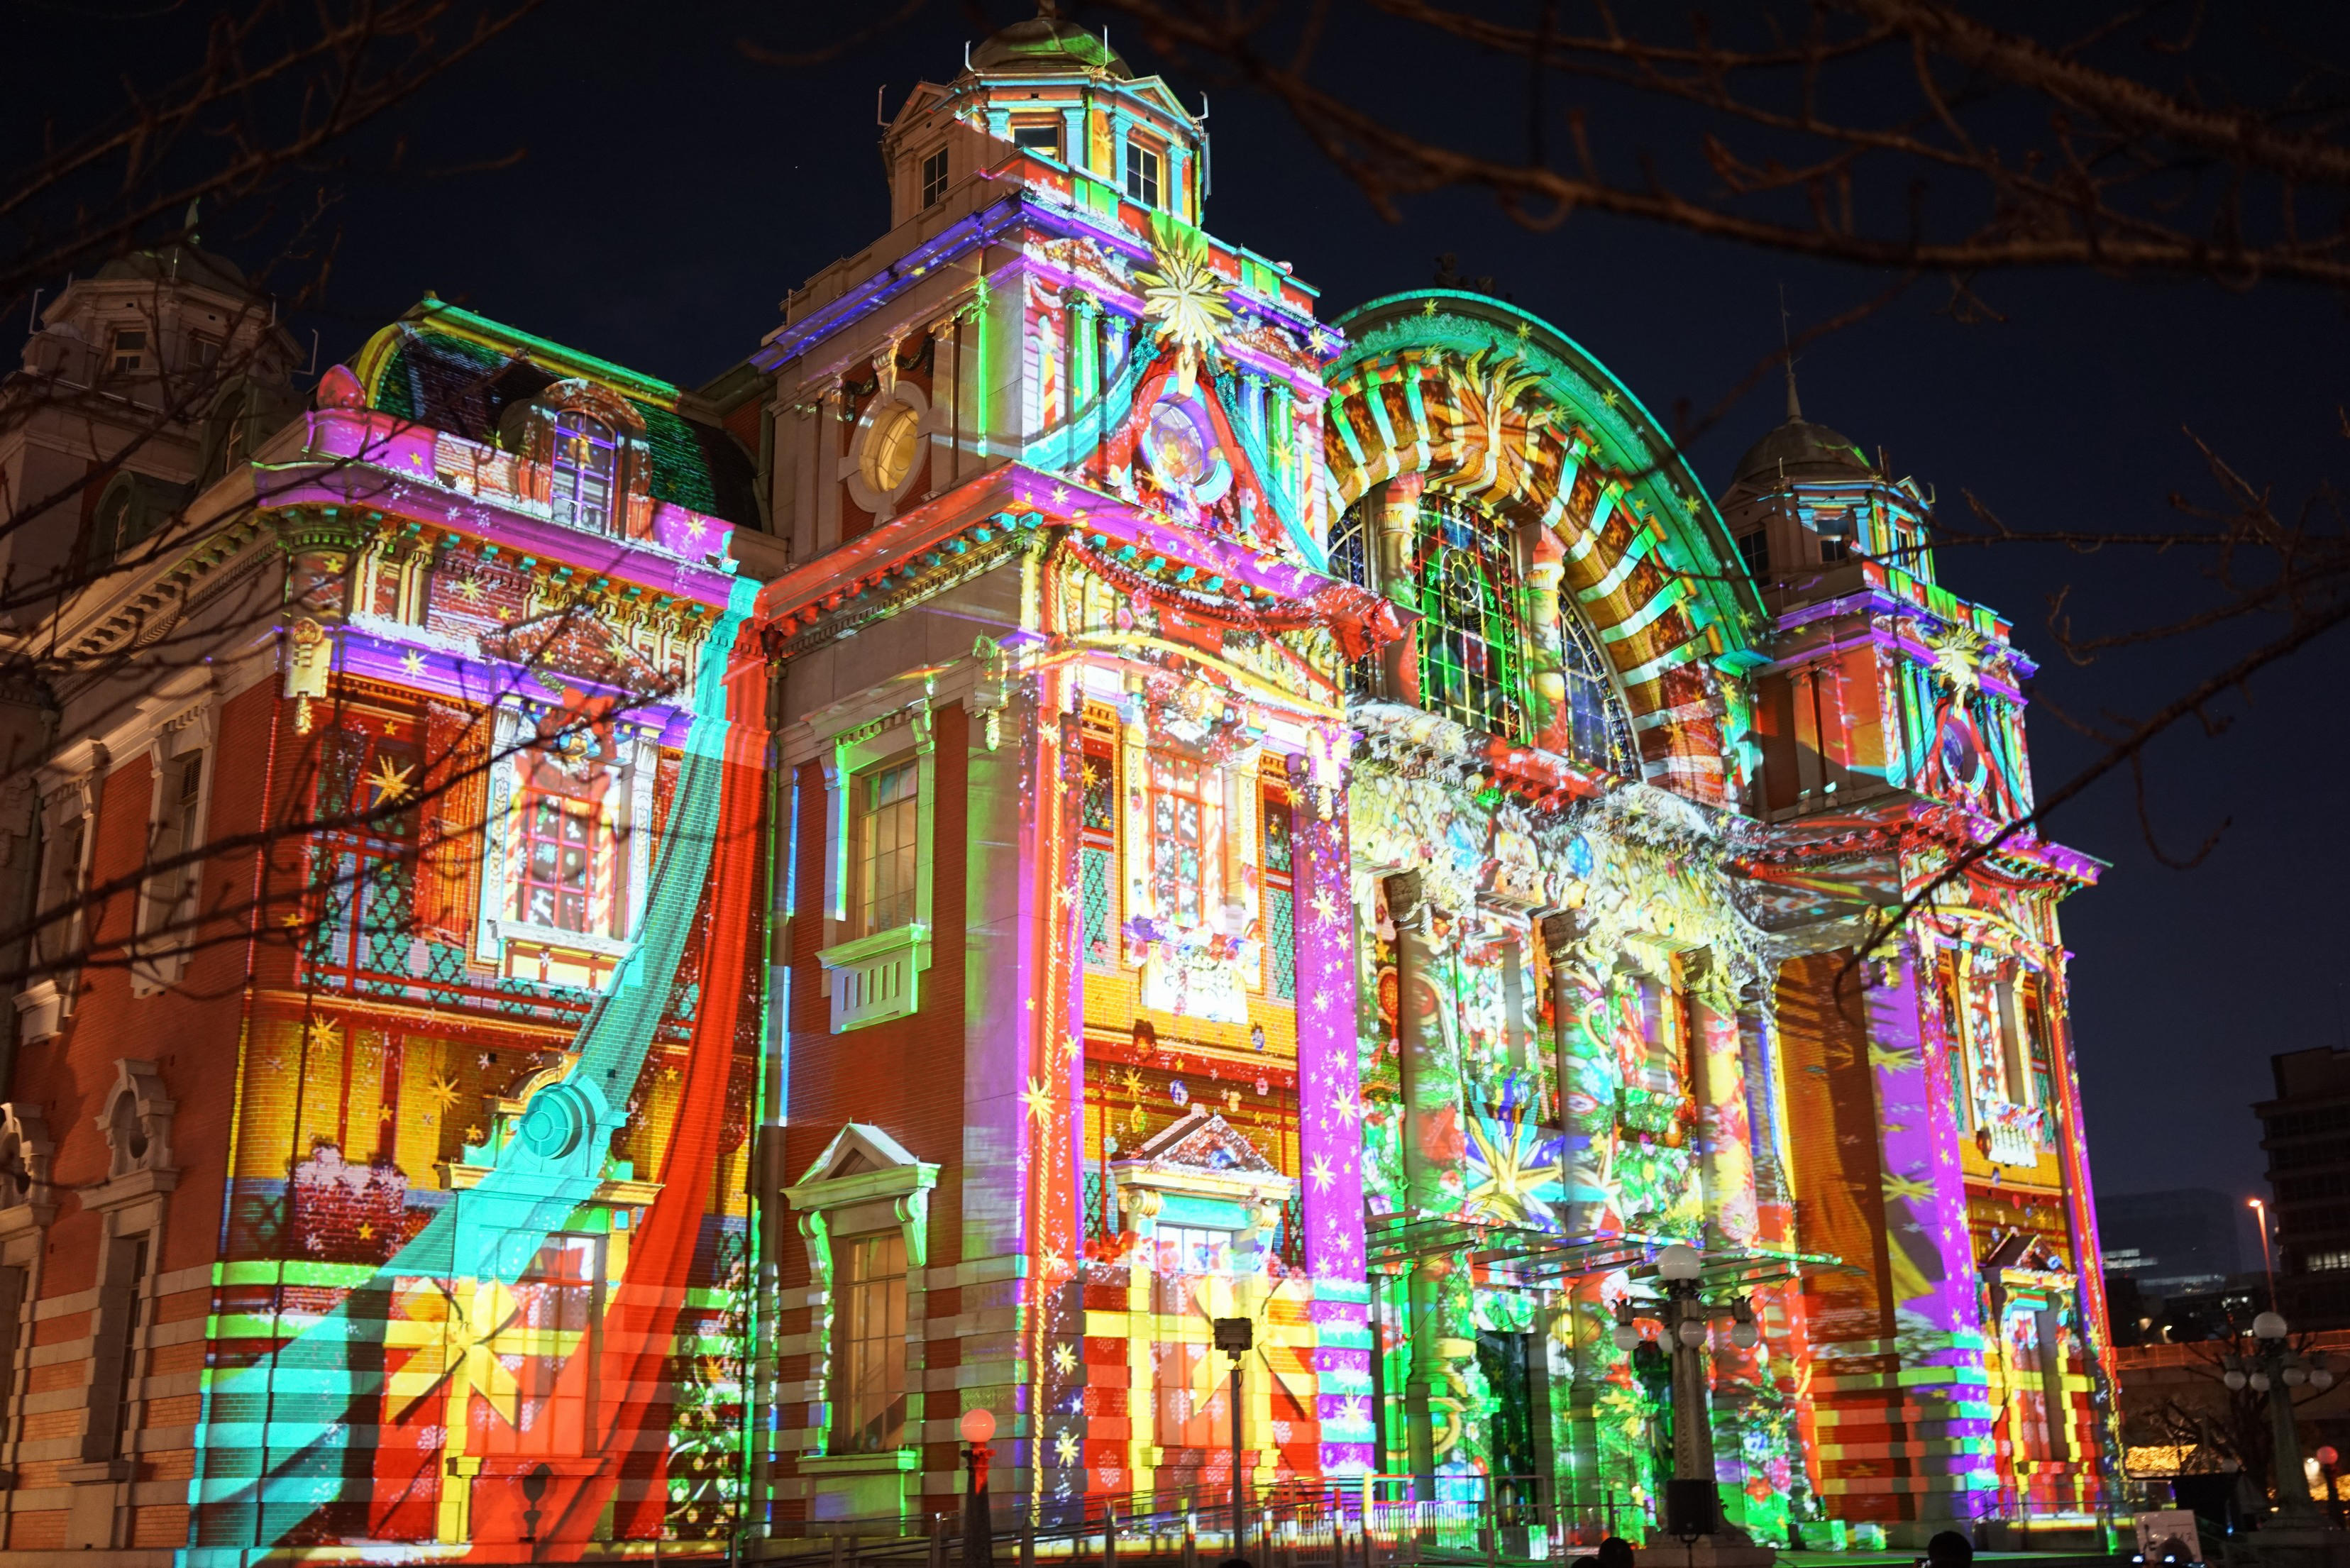 Hikari Renaissance winter illumination or projection mapping Osaka Japan